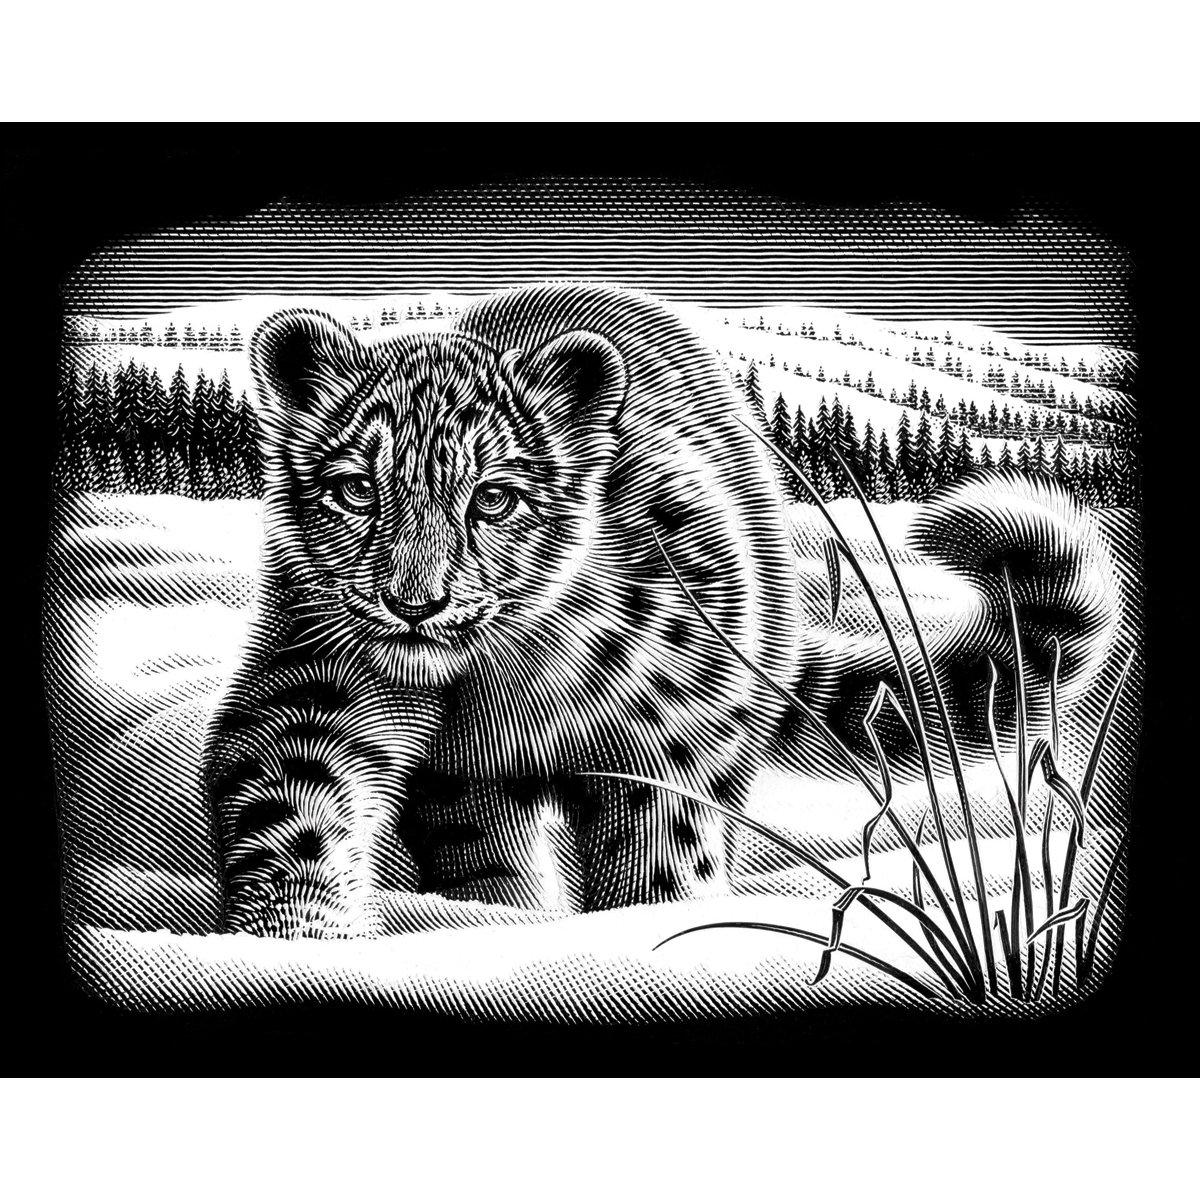 Reeves Snow Leopard Scraperfoil Artwork, Silver